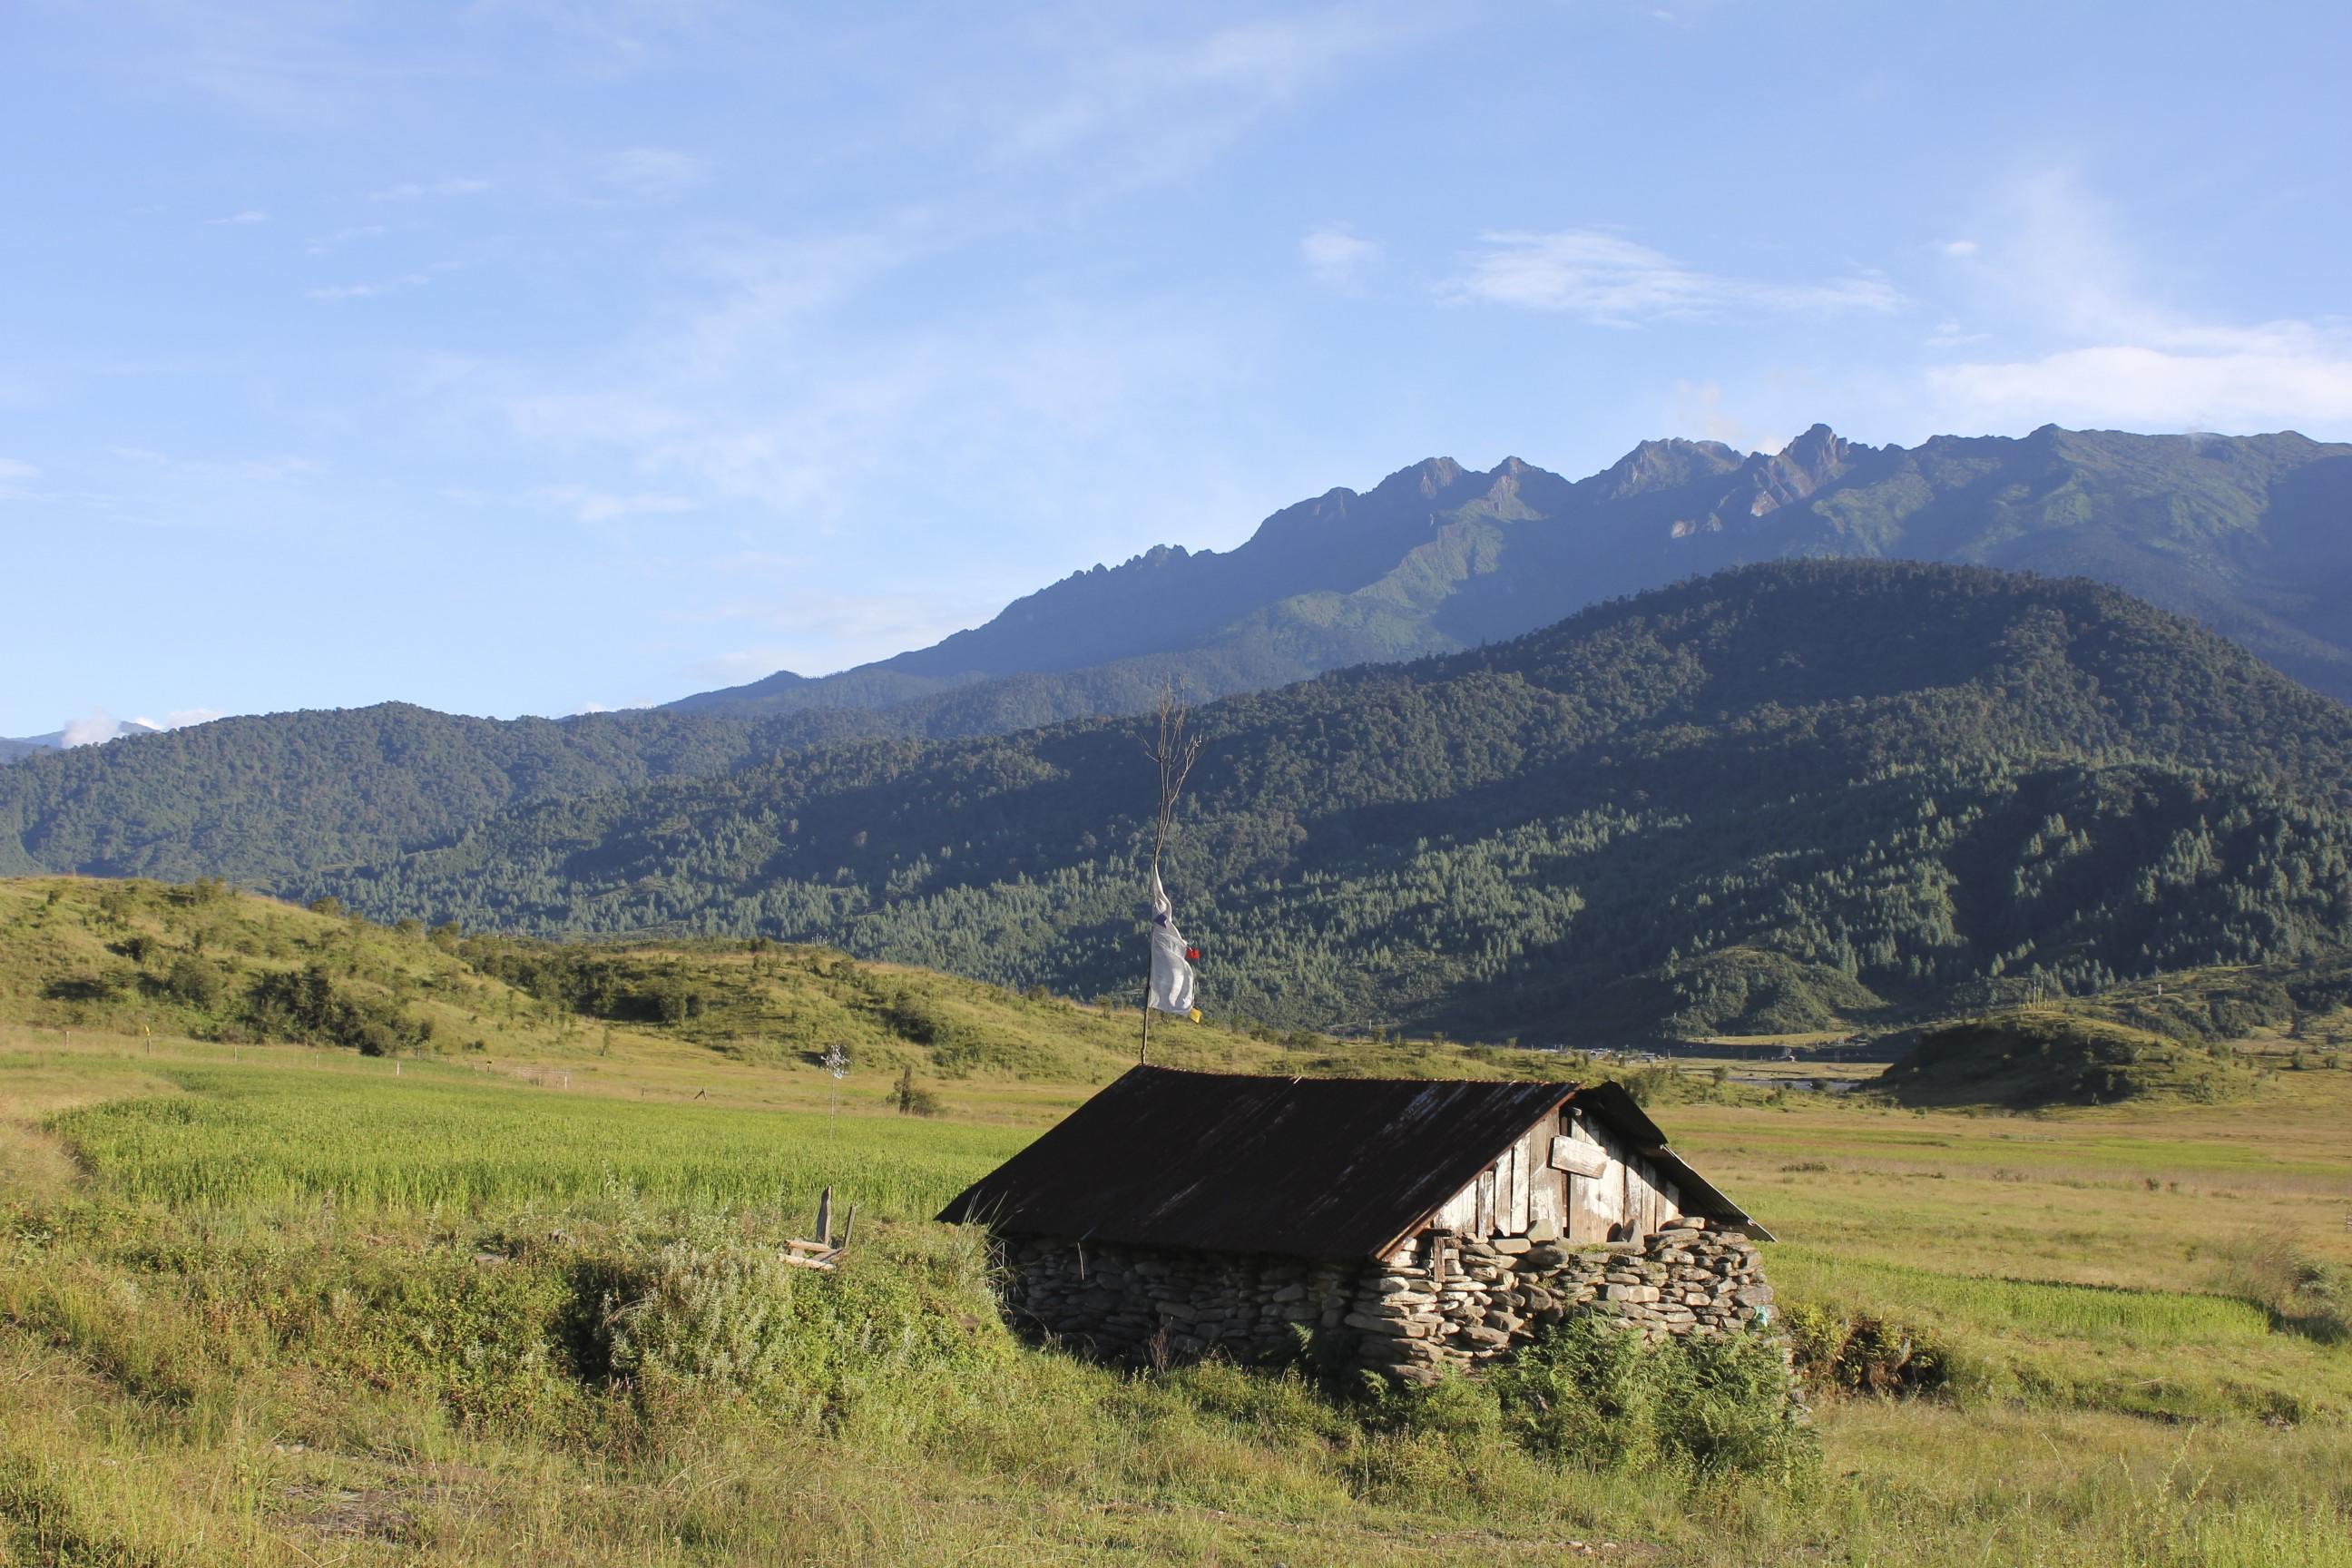 Mechuka Village